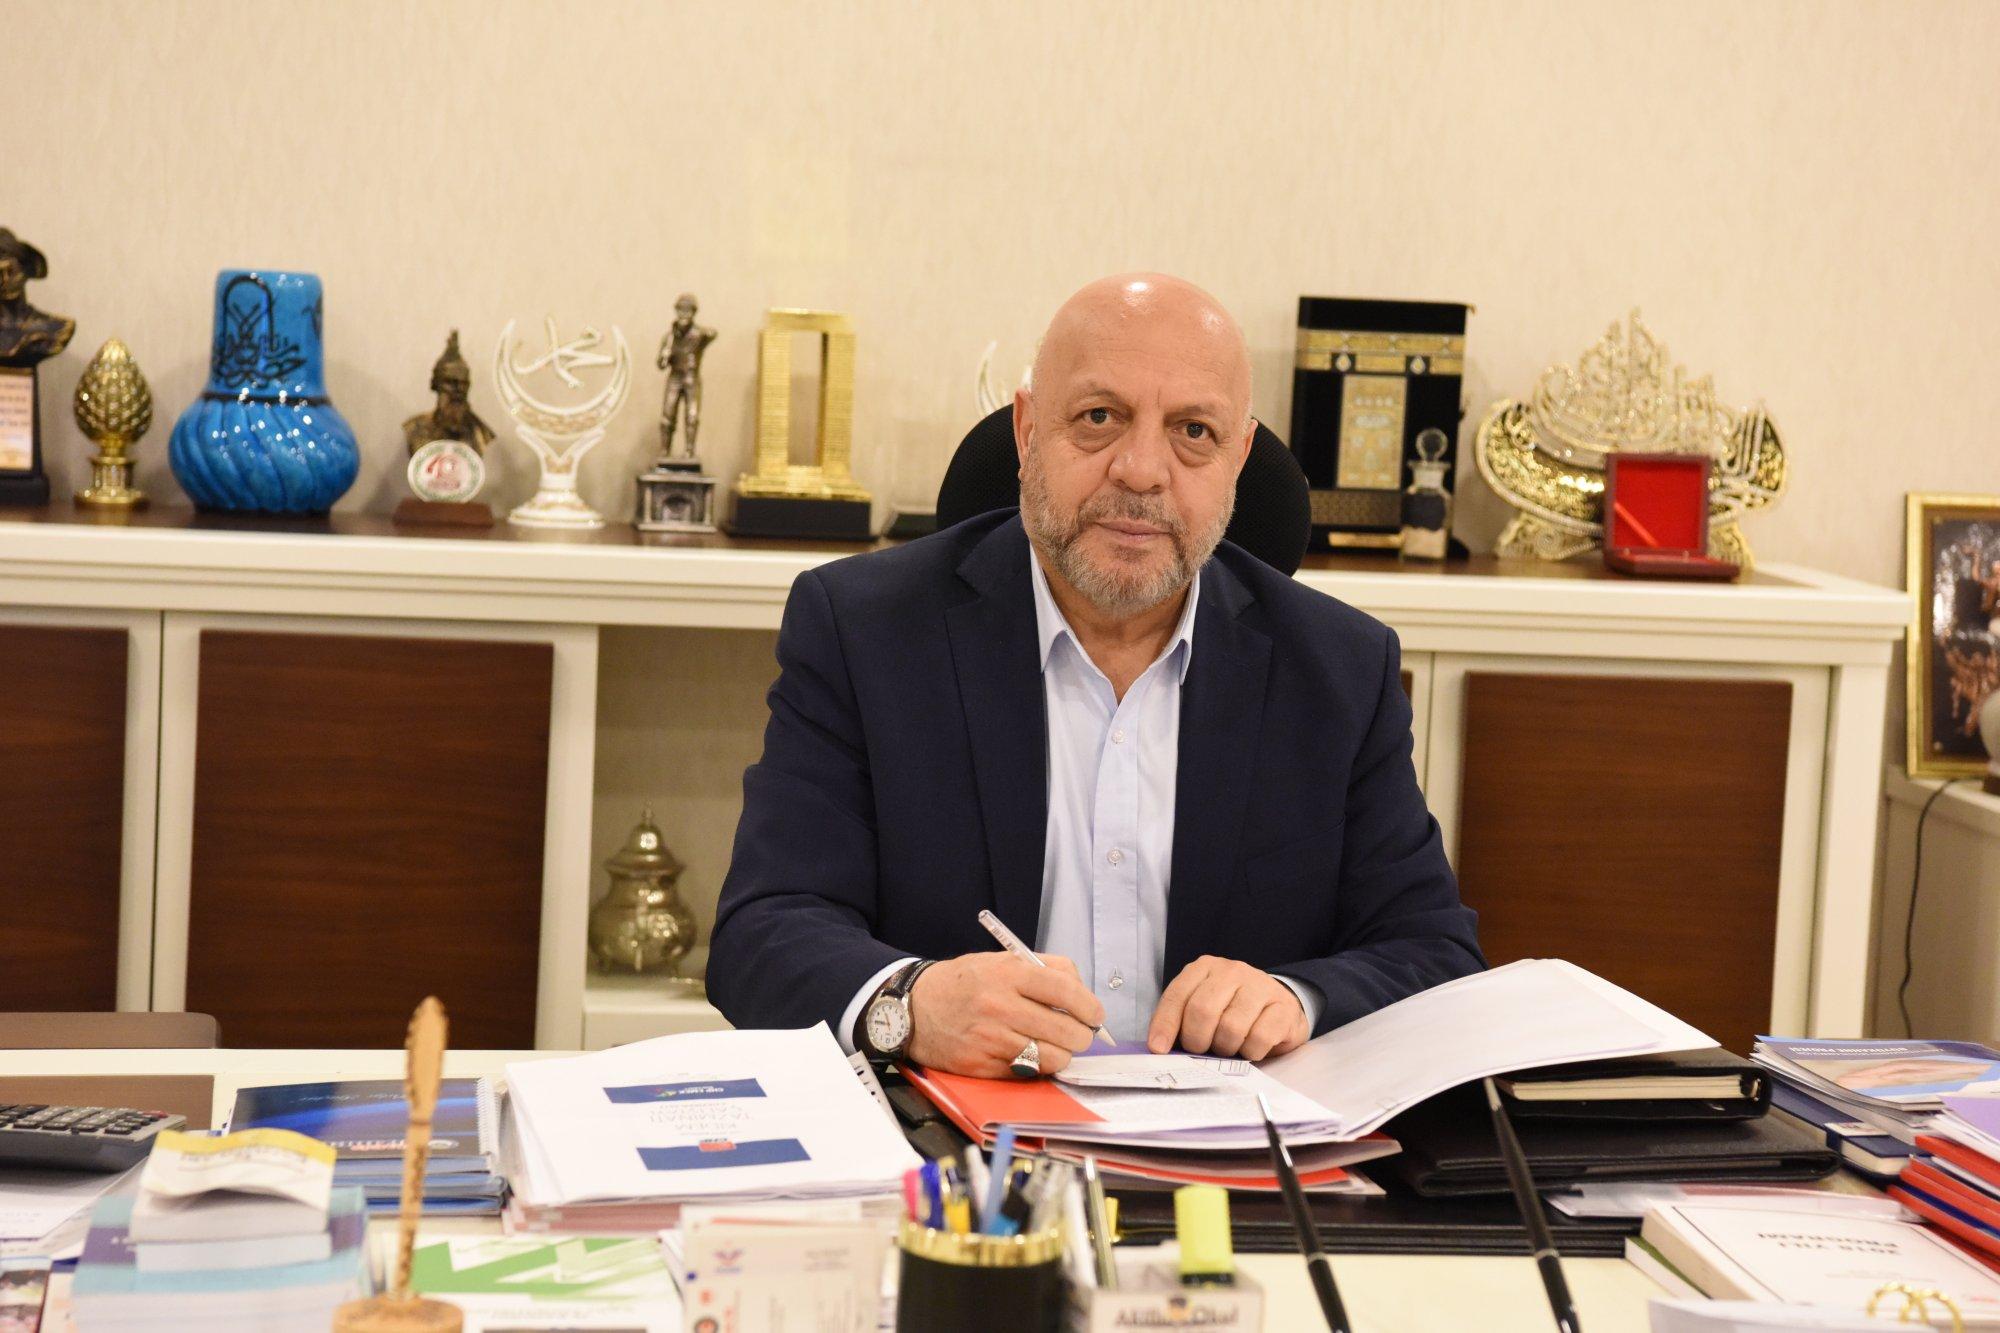 ARSLAN'DAN BM GENEL SEKRETERİ ANTÓNİO GUTERRES'E MEKTUP